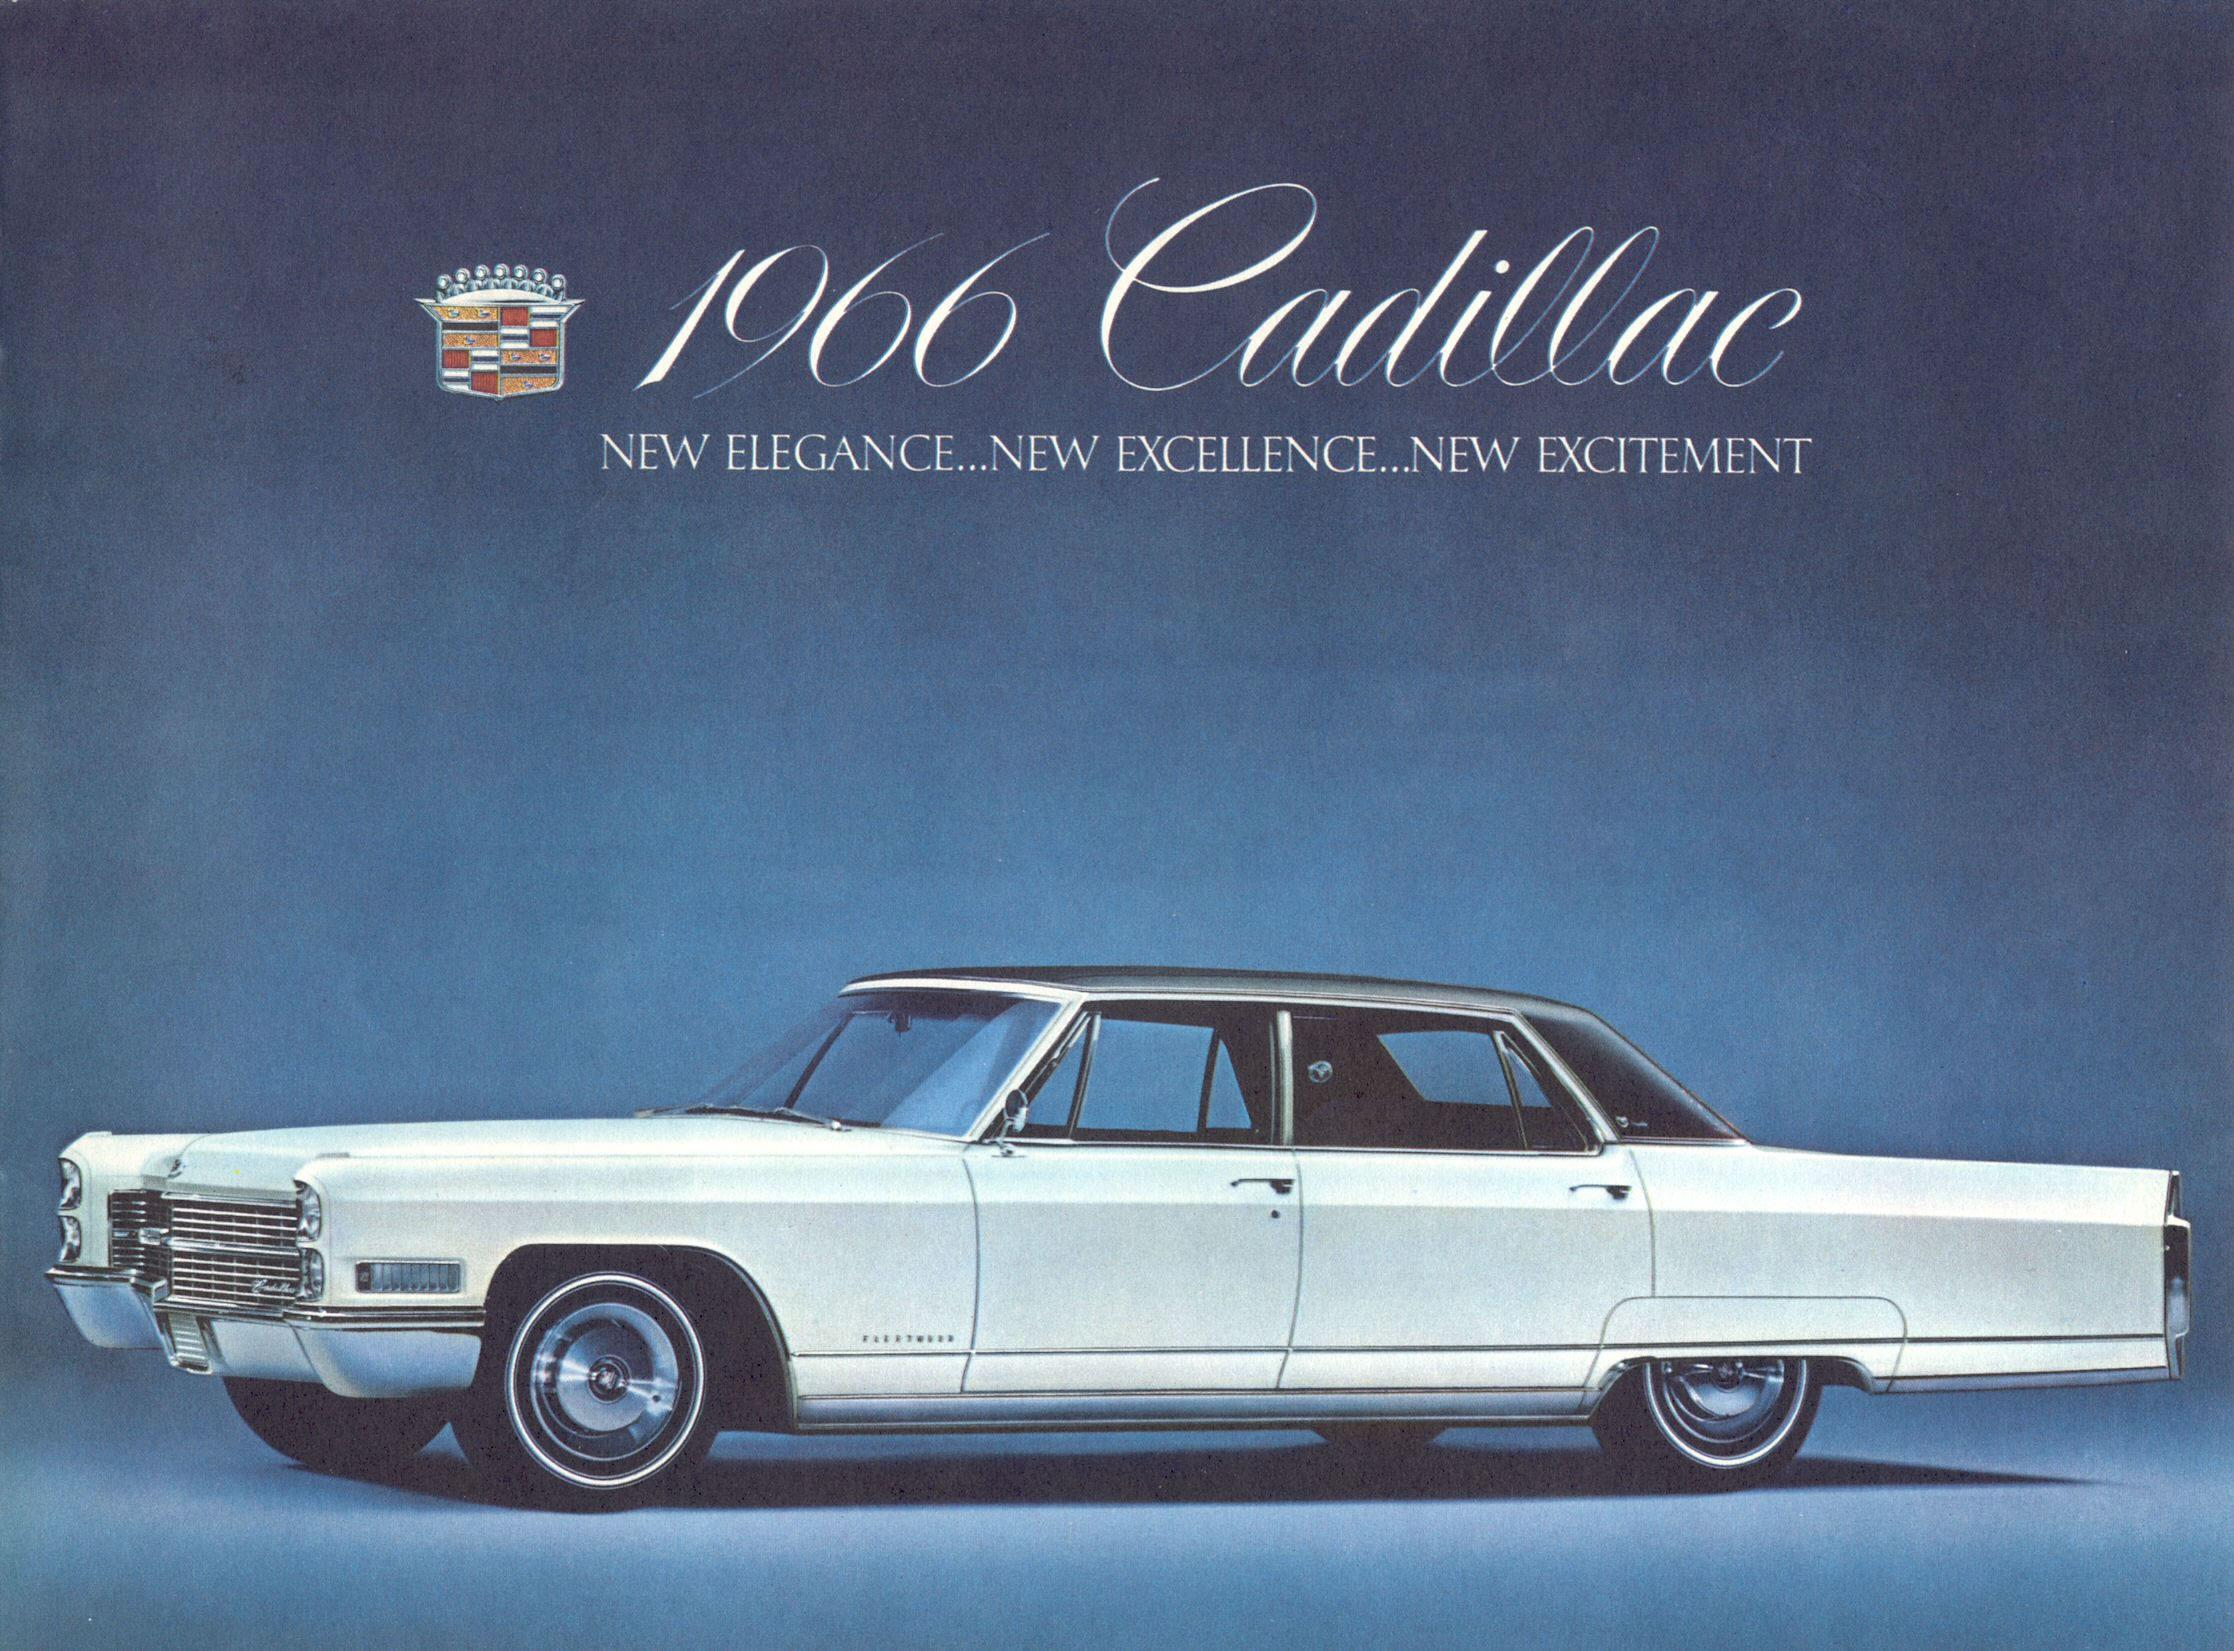 1966 Cadillac Brochure Page 01 Jpg